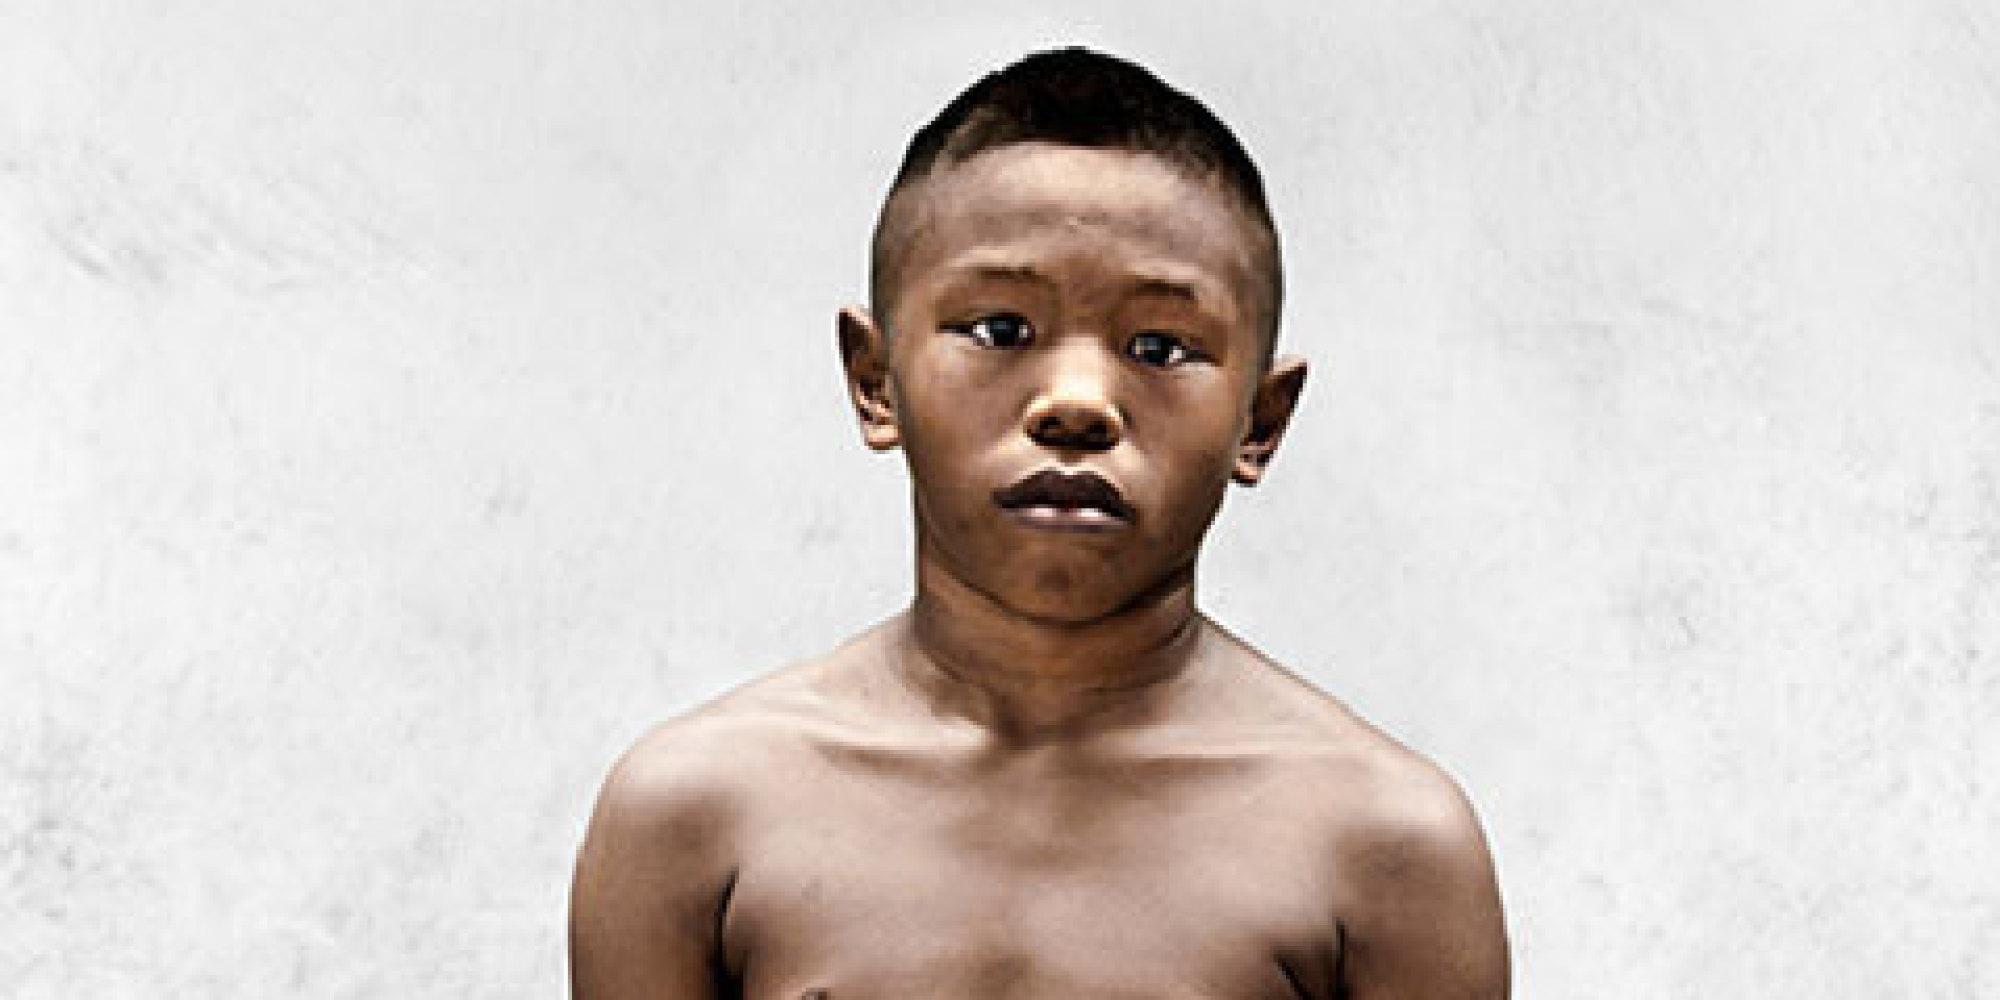 thai young nude boy